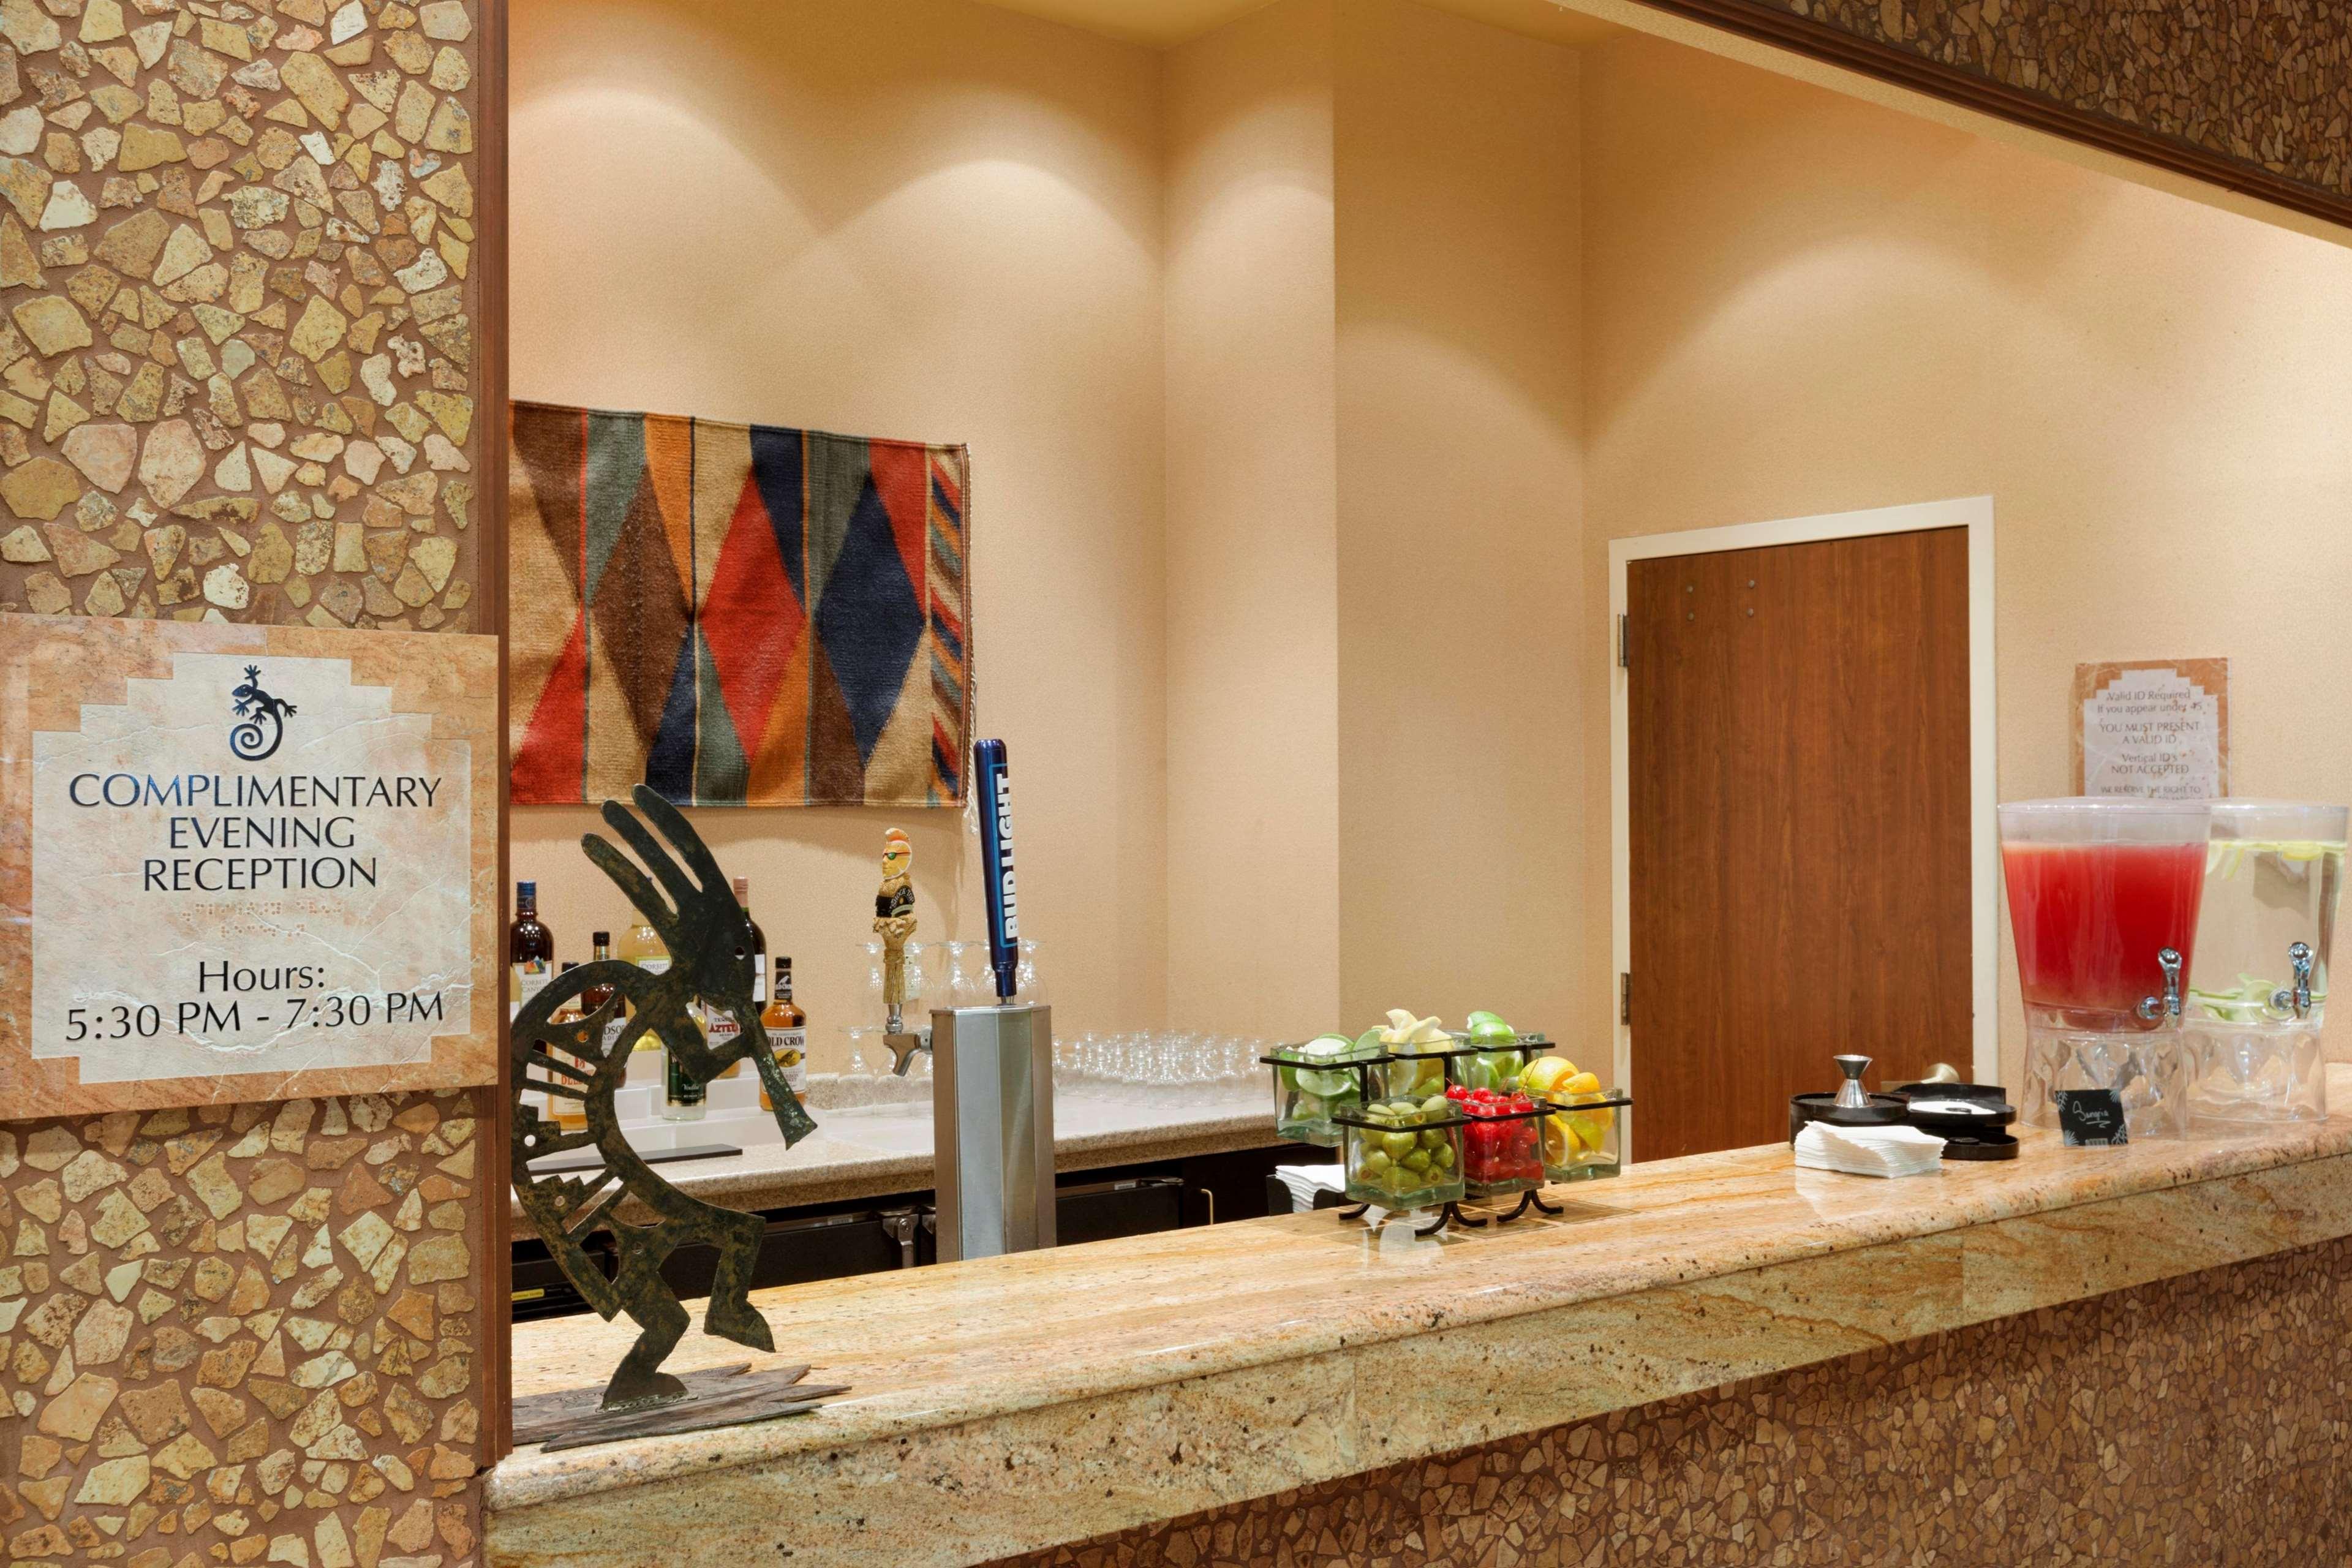 Embassy Suites by Hilton Albuquerque Hotel & Spa image 43